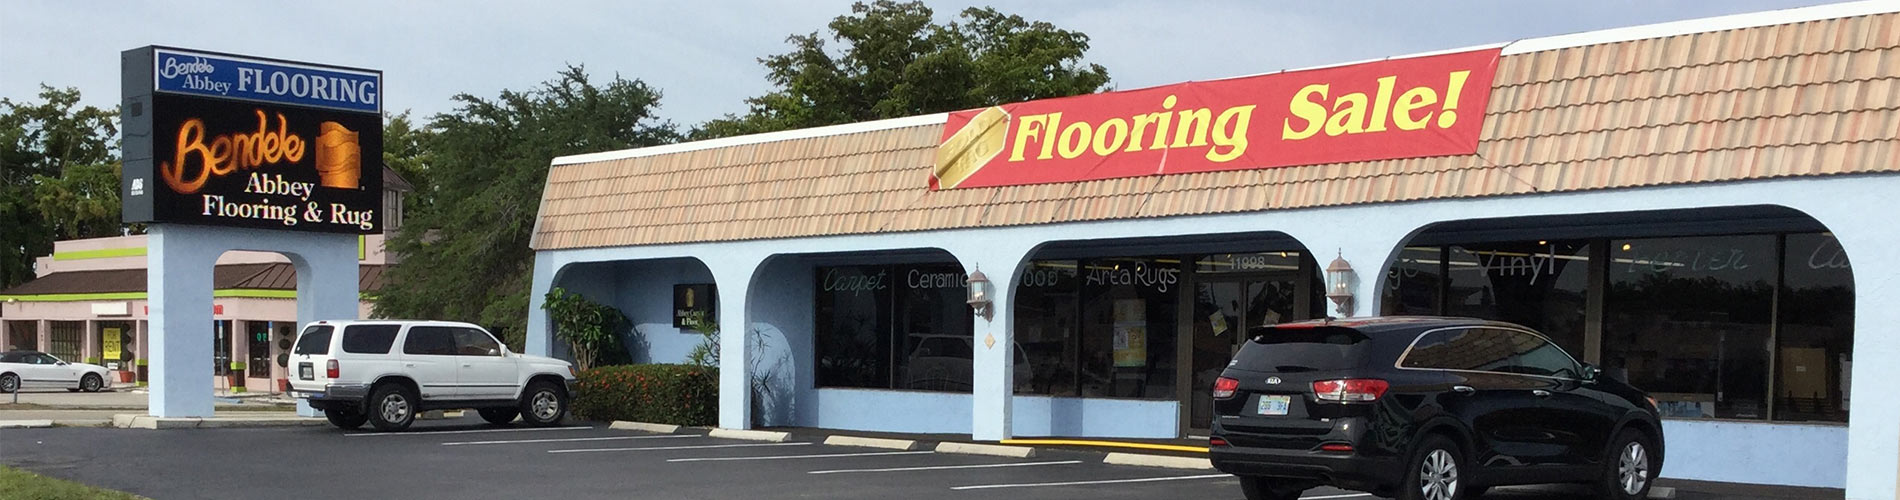 Bendele Abbey Flooring & Rug storefront